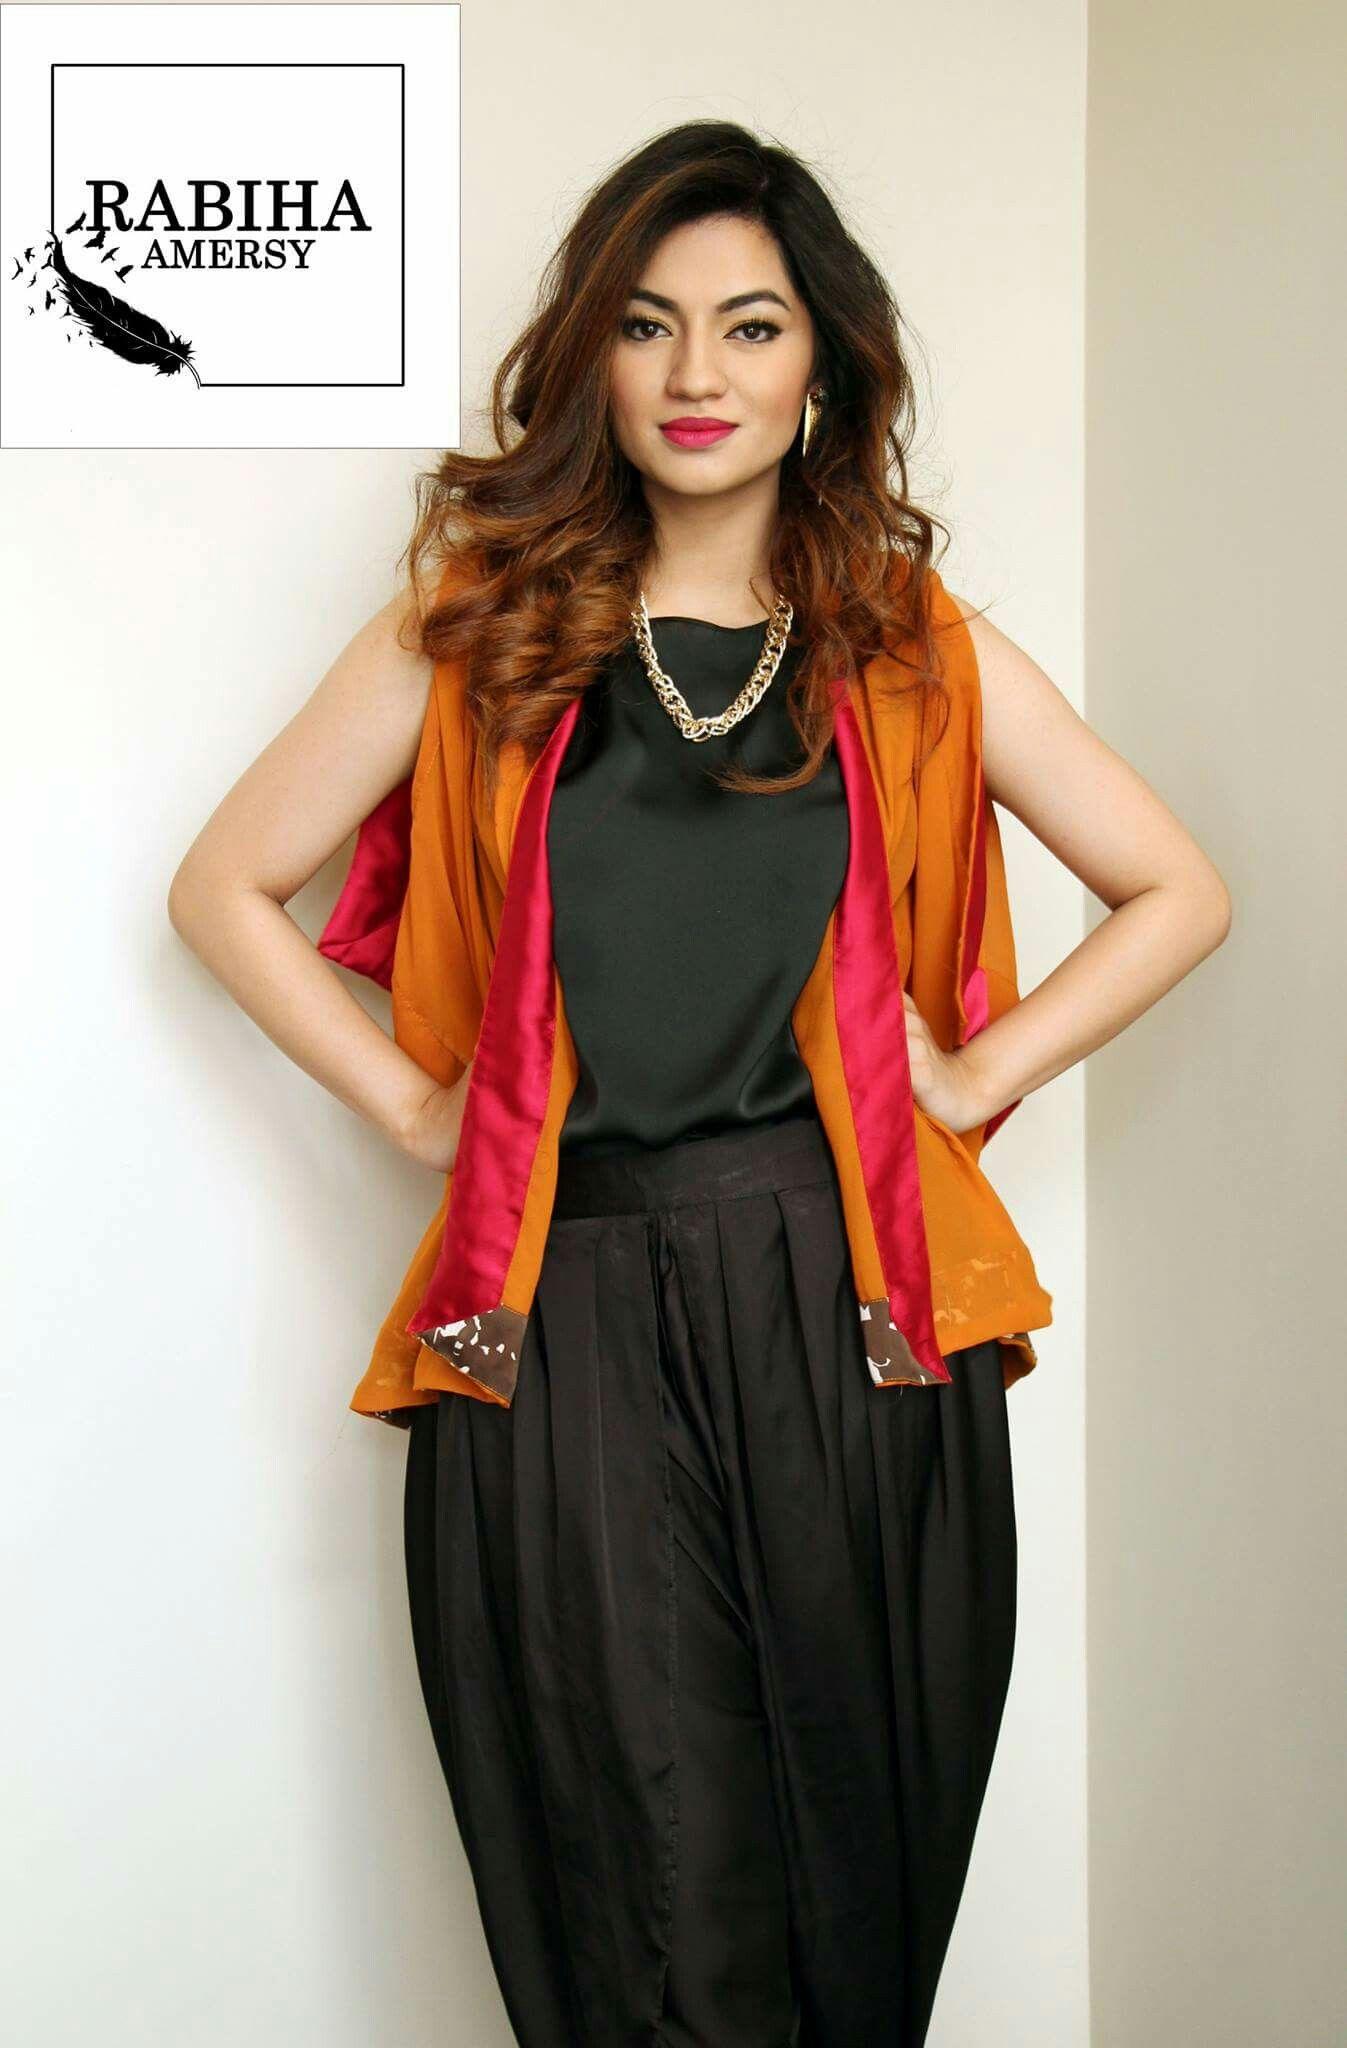 eb308d0cb711 A vibrant orange and pink Chiffon cape jacket | Rabiha Amersy | Cape ...